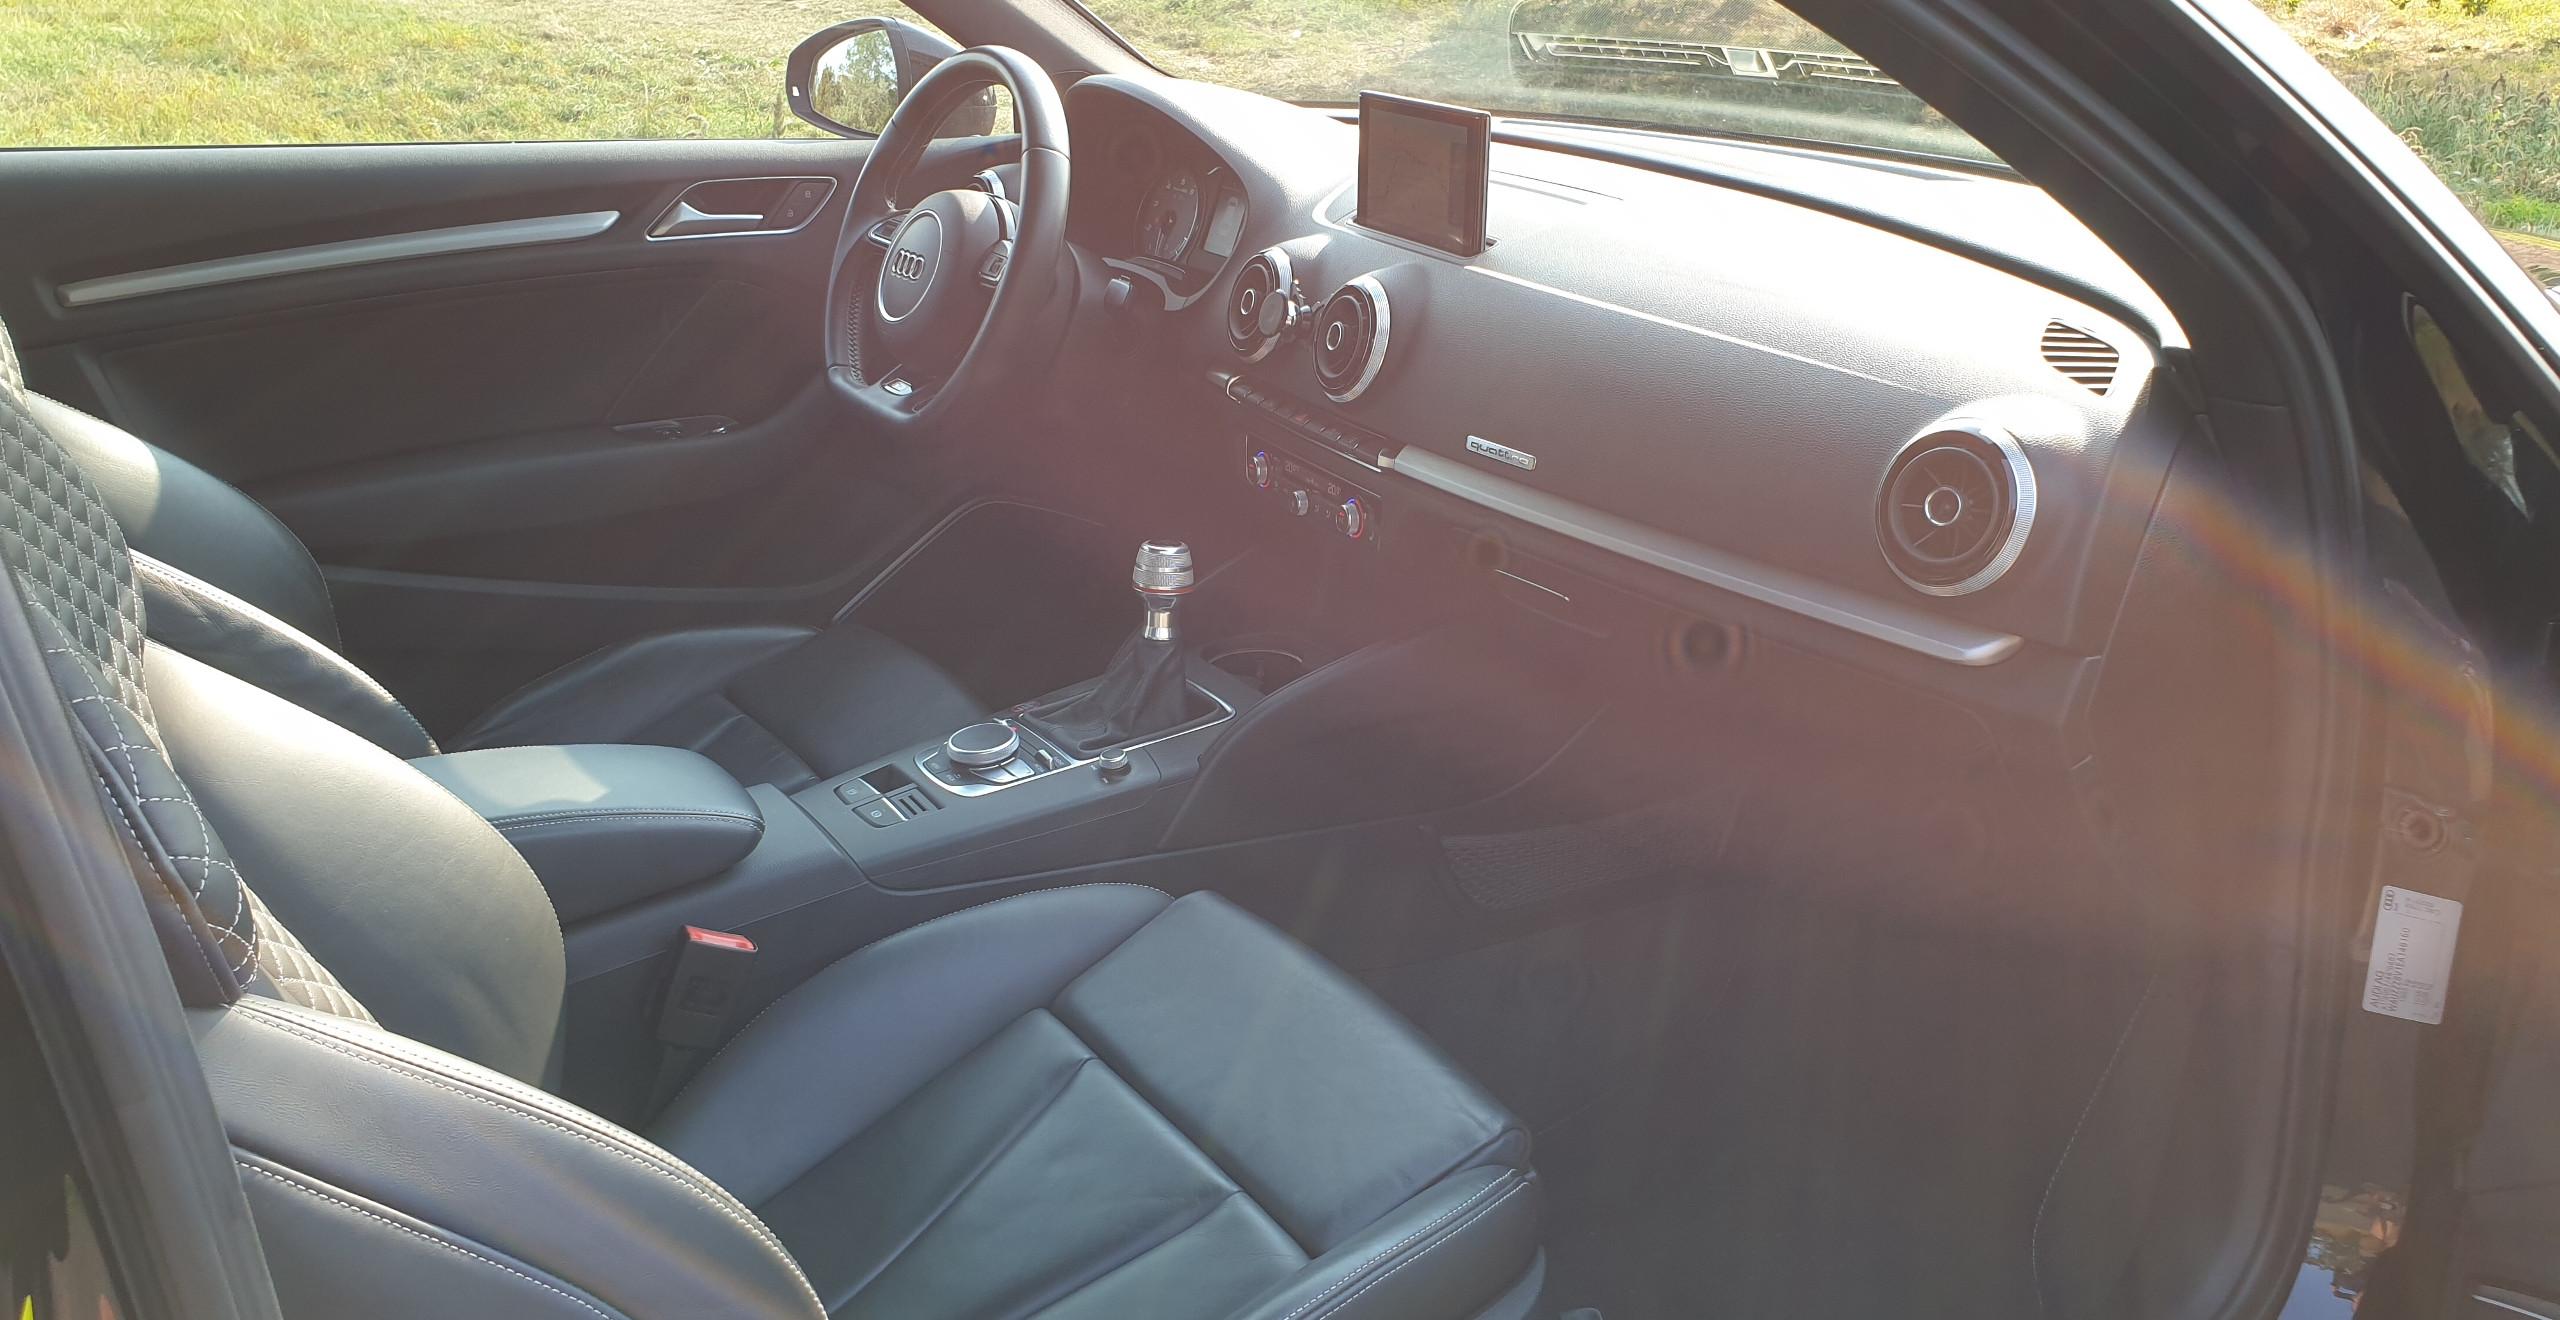 Import Auto Allemagne - Auto Convoi Allemagne -  Audi S3 2.0 TFSI Quattro 300ch